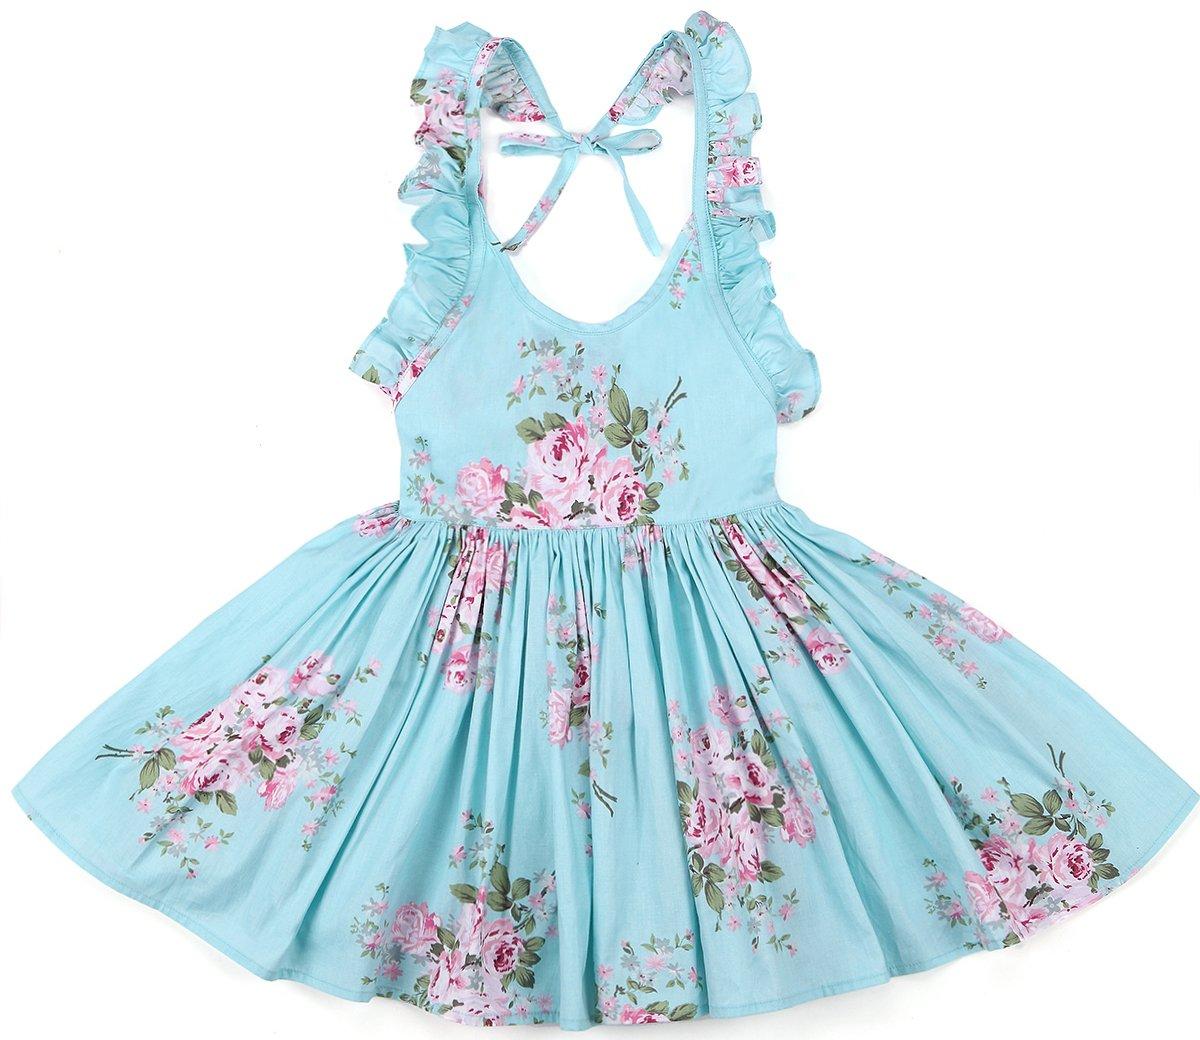 ee2eb07873a Flofallzique Vintage Floral Blue Girls Dress Baby Backless Easter Sundress  Toddler Clothes product image